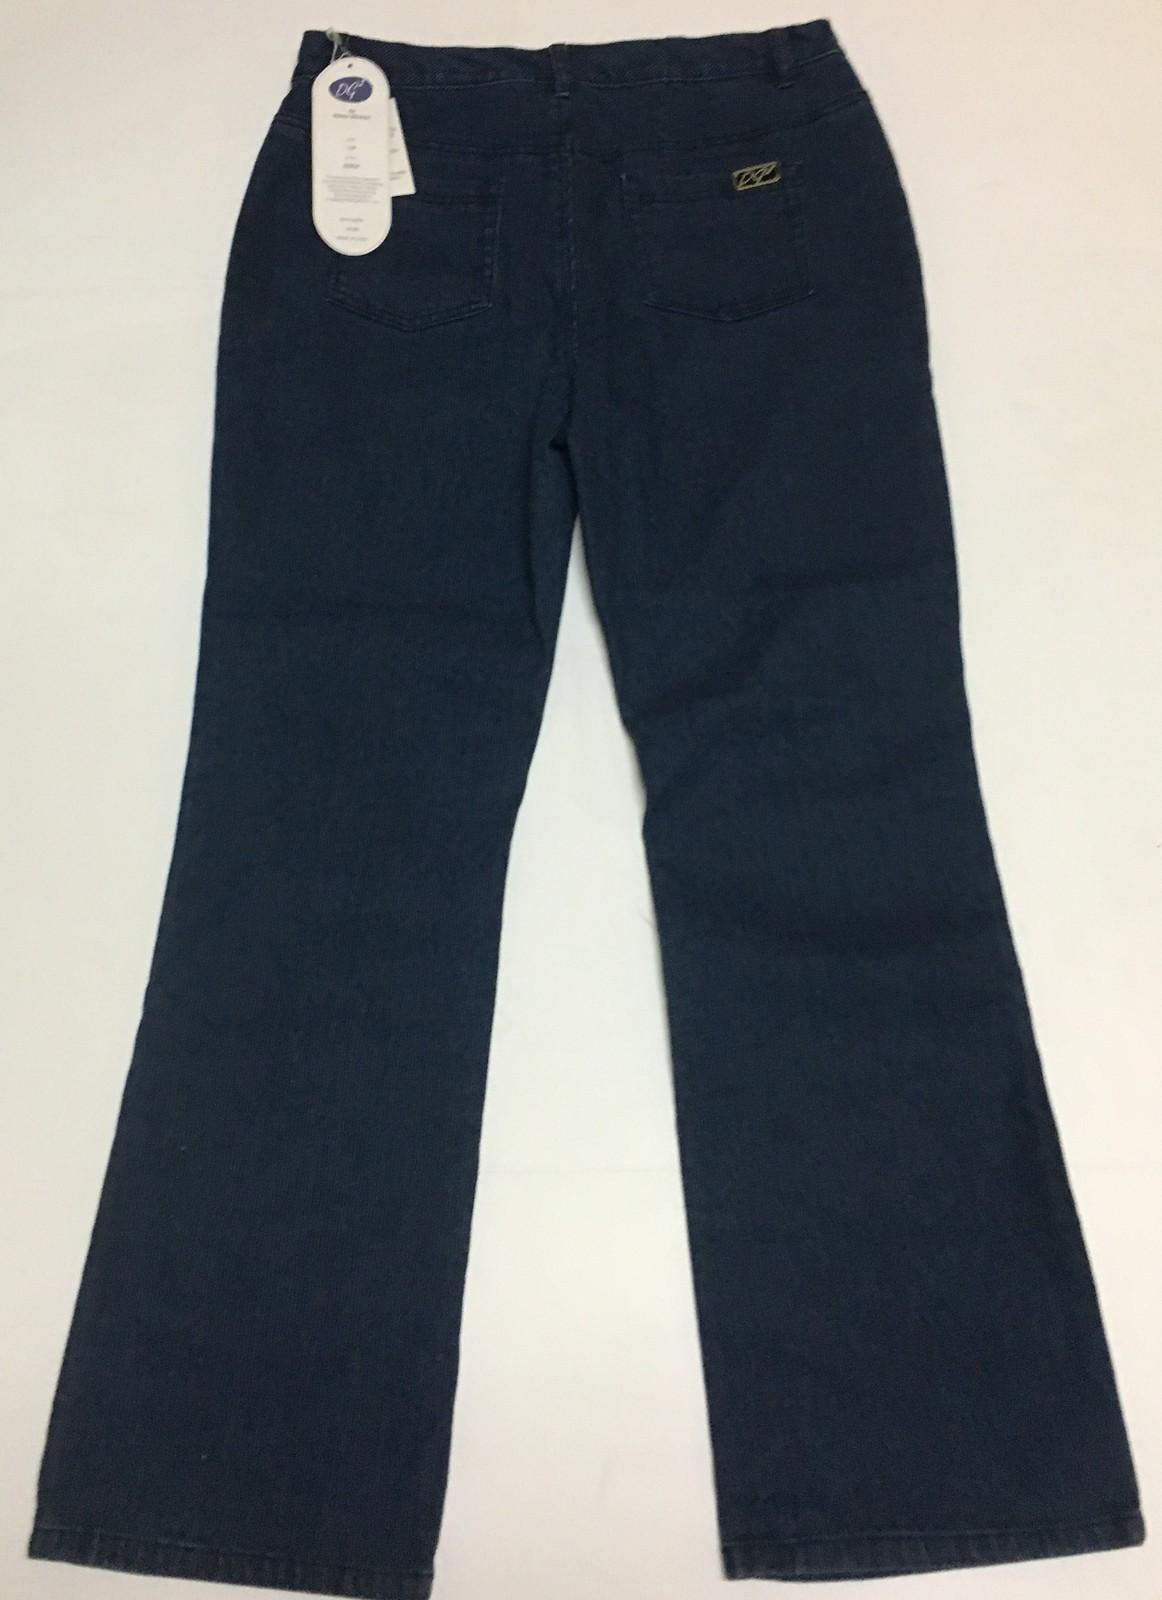 Diane Gilman Pinstriped Jeans 10P Blue NWT